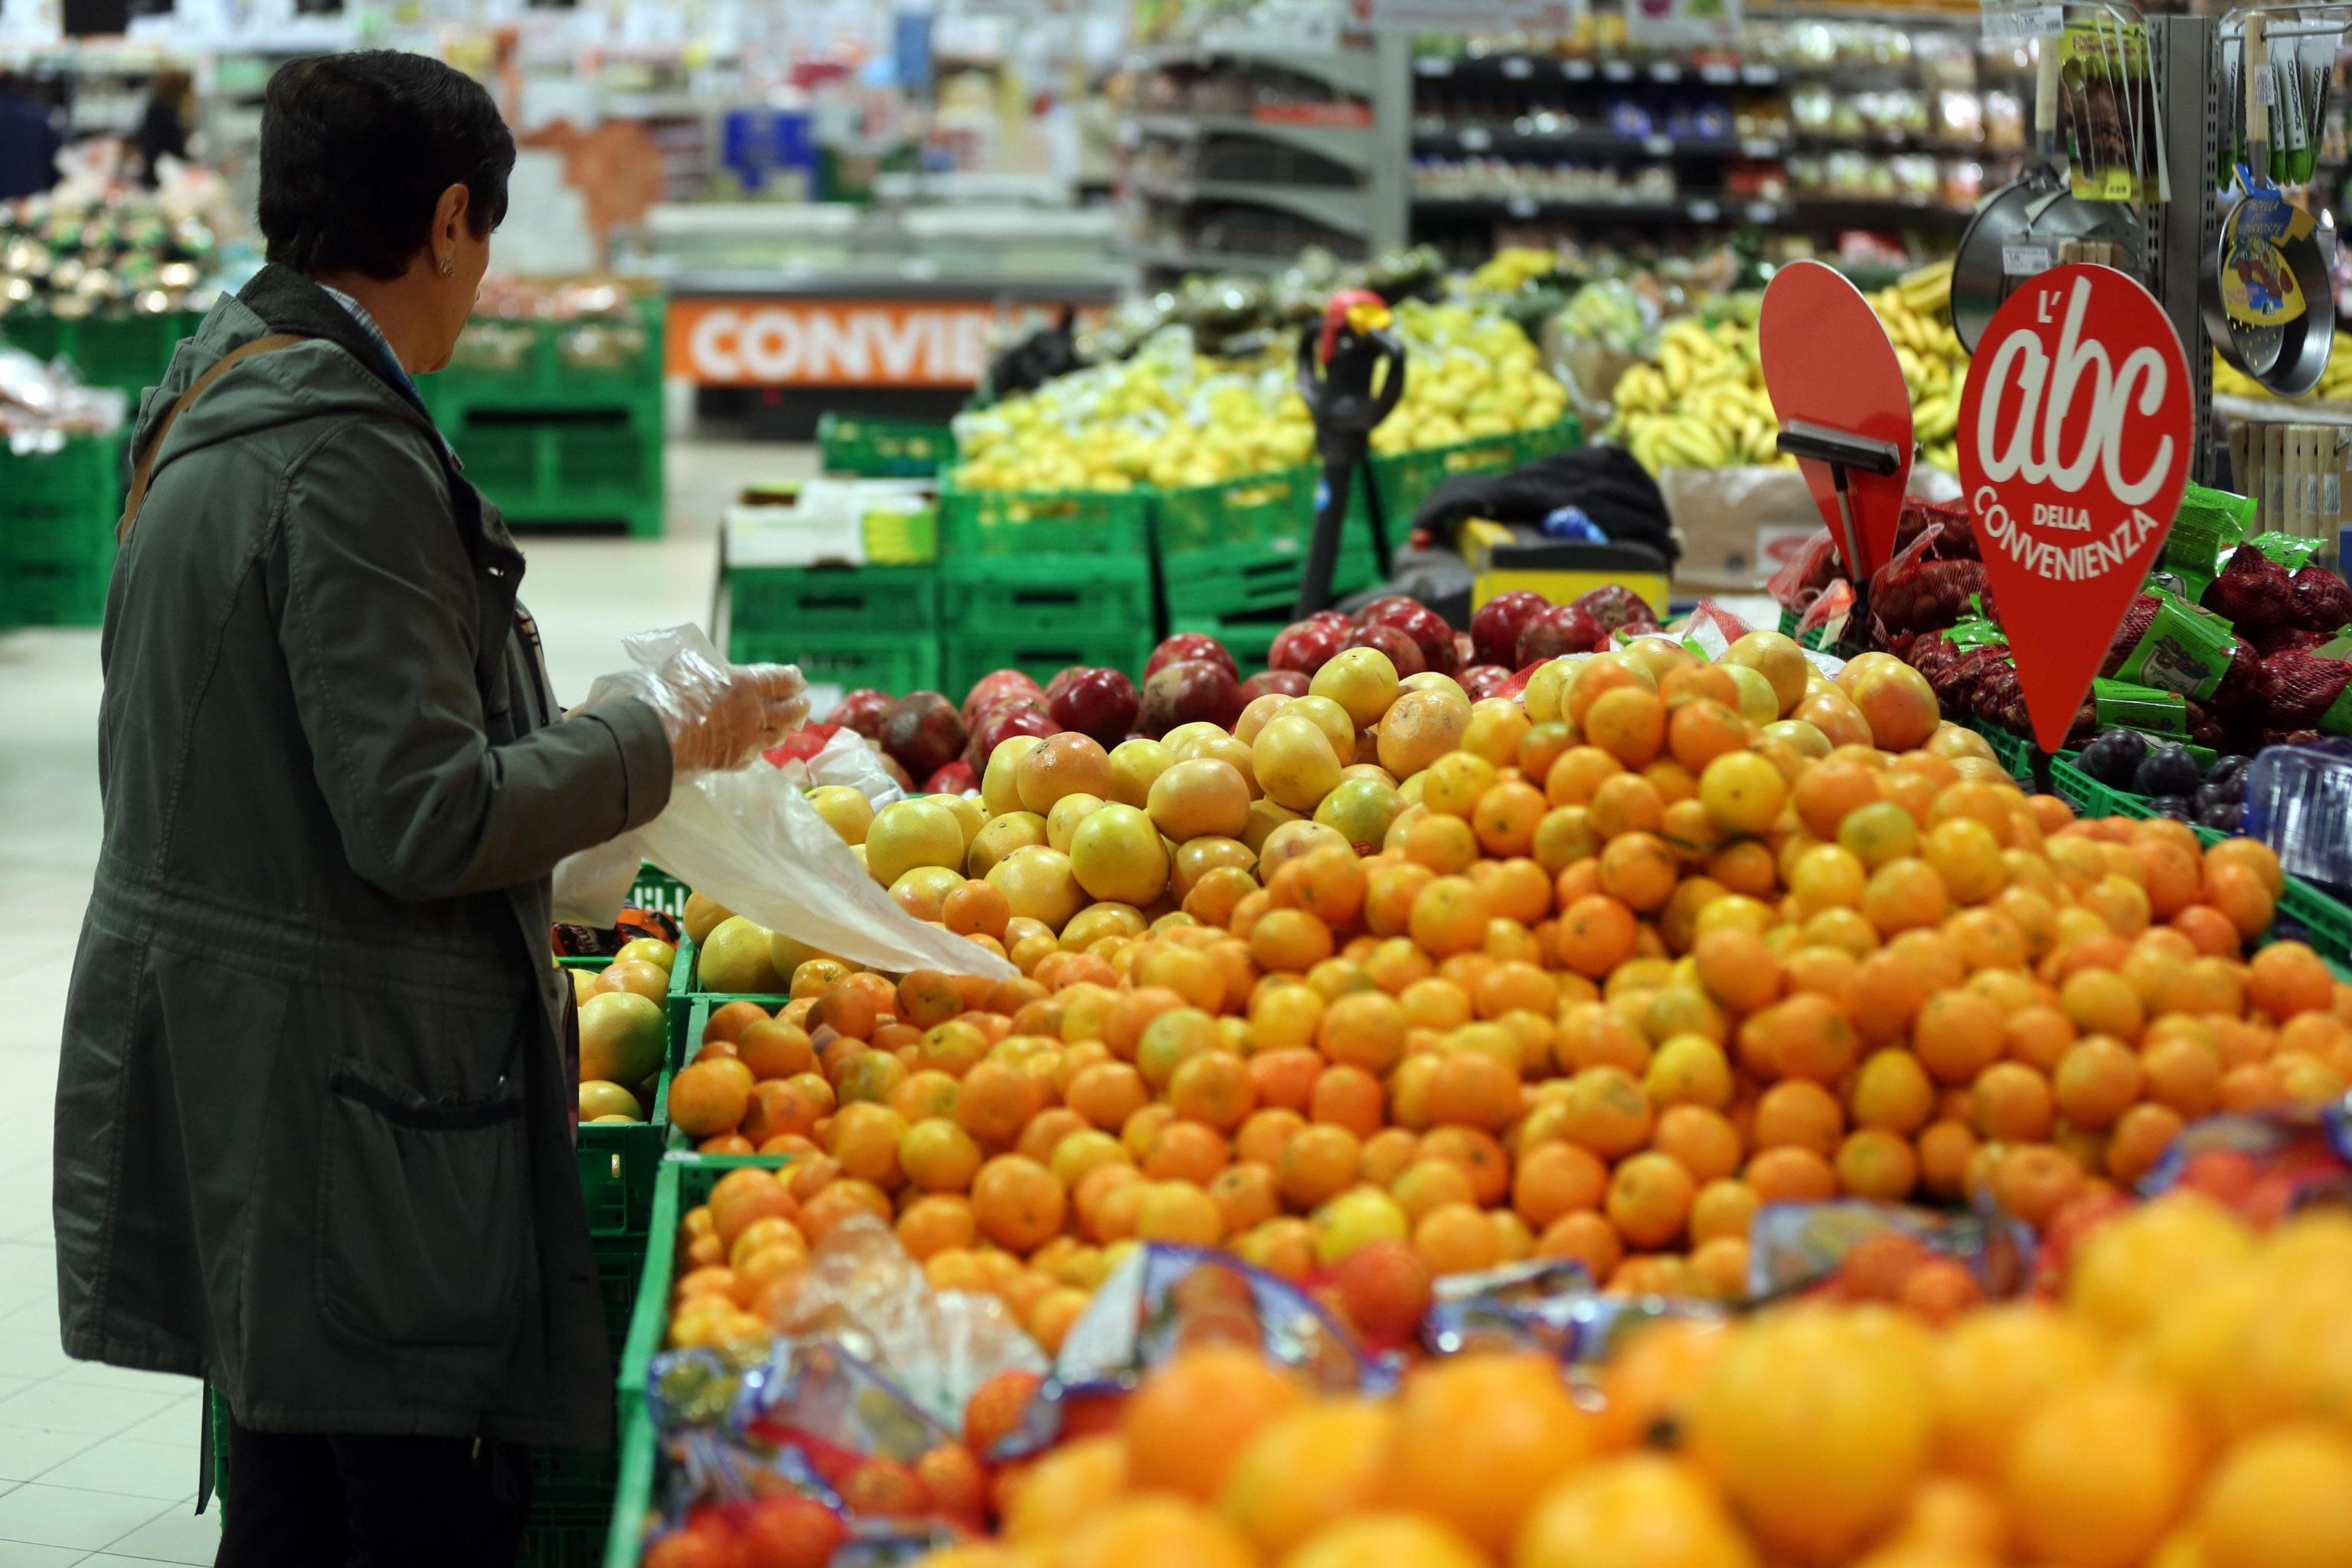 Tassa sulla spesa: si pagheranno anche i sacchetti per frutta e verdura